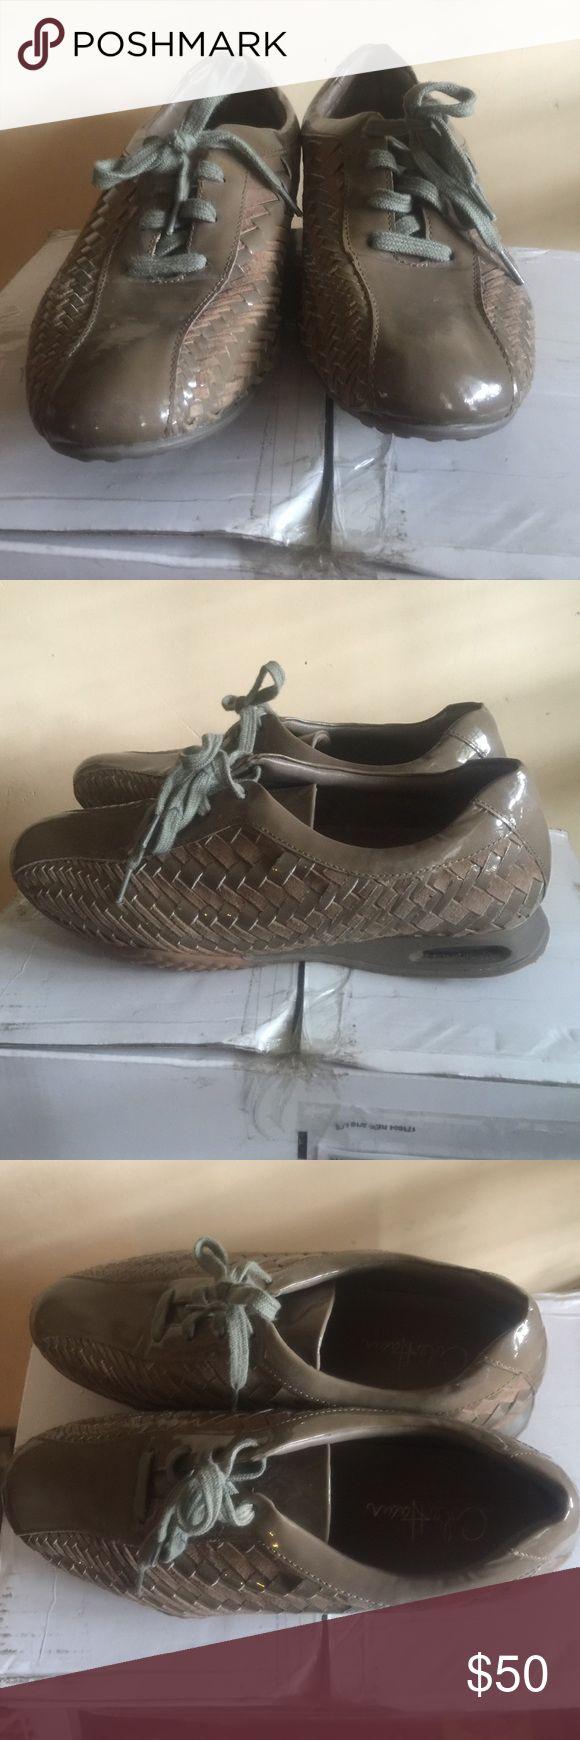 Women's Cole Haan sneakers Woven tan Cole Haan Air Bria kinda squeaky when walking Cole Haan Shoes Sneakers